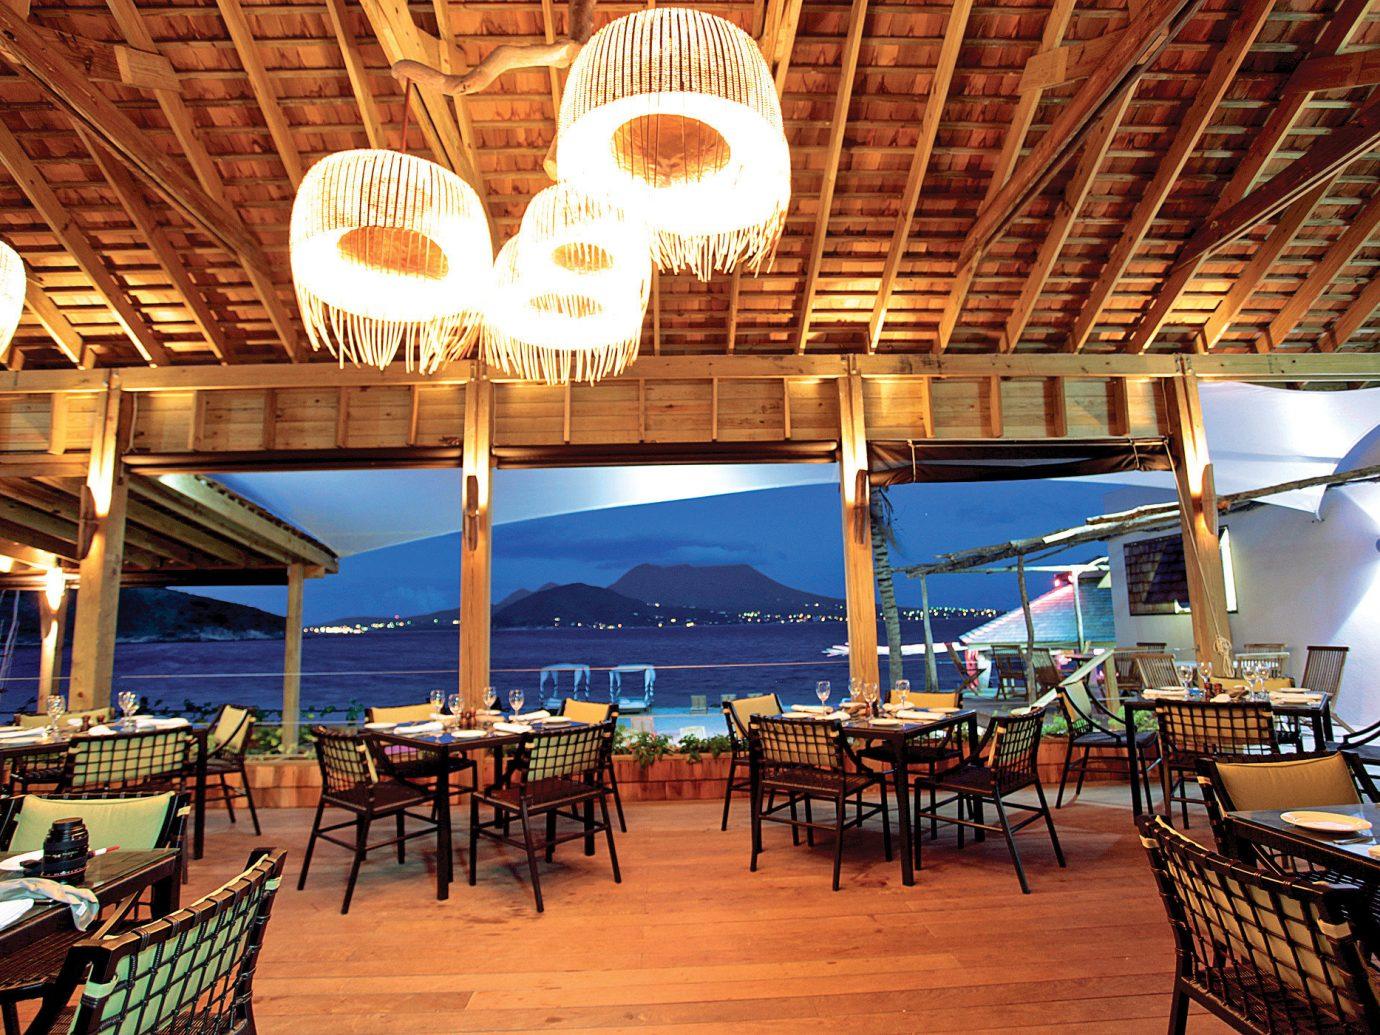 Trip Ideas chair table restaurant Resort estate meal function hall Bar set several dock